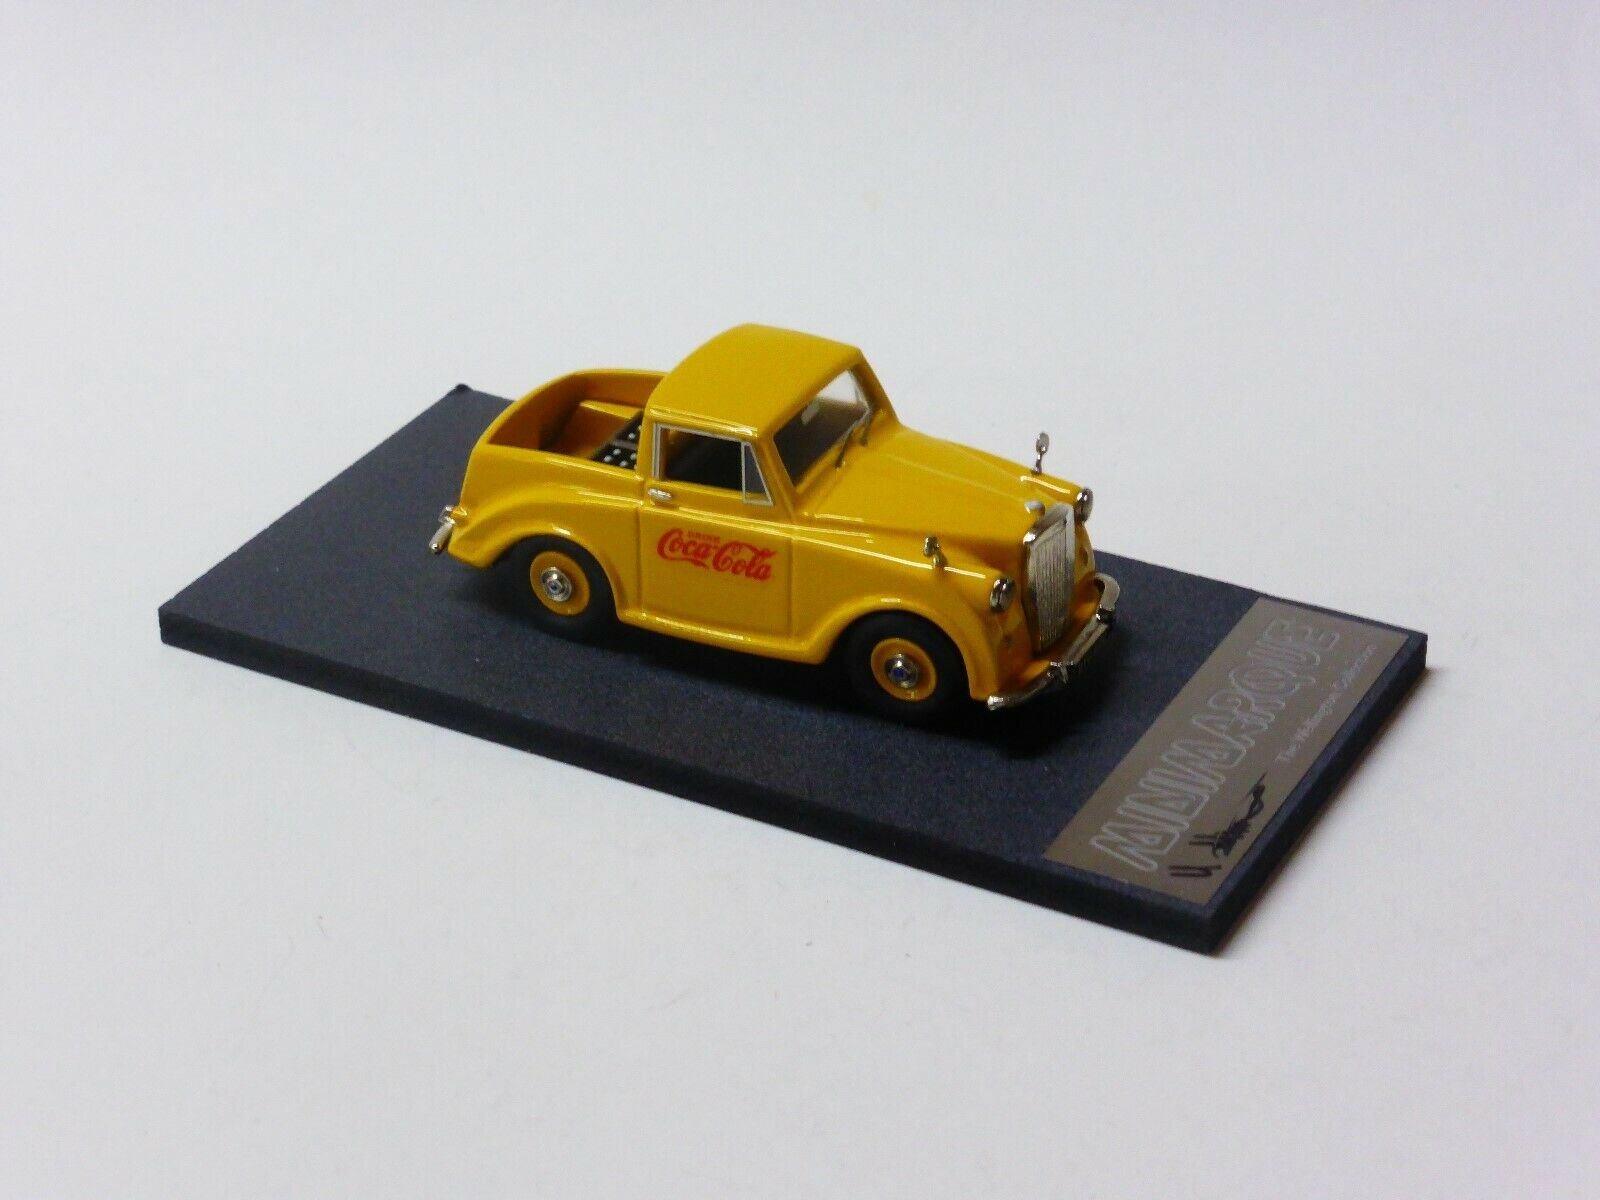 GRB95  Minimarque Models, 1952 Triumph Mayflower Ute 1 43 not Pathfinder models